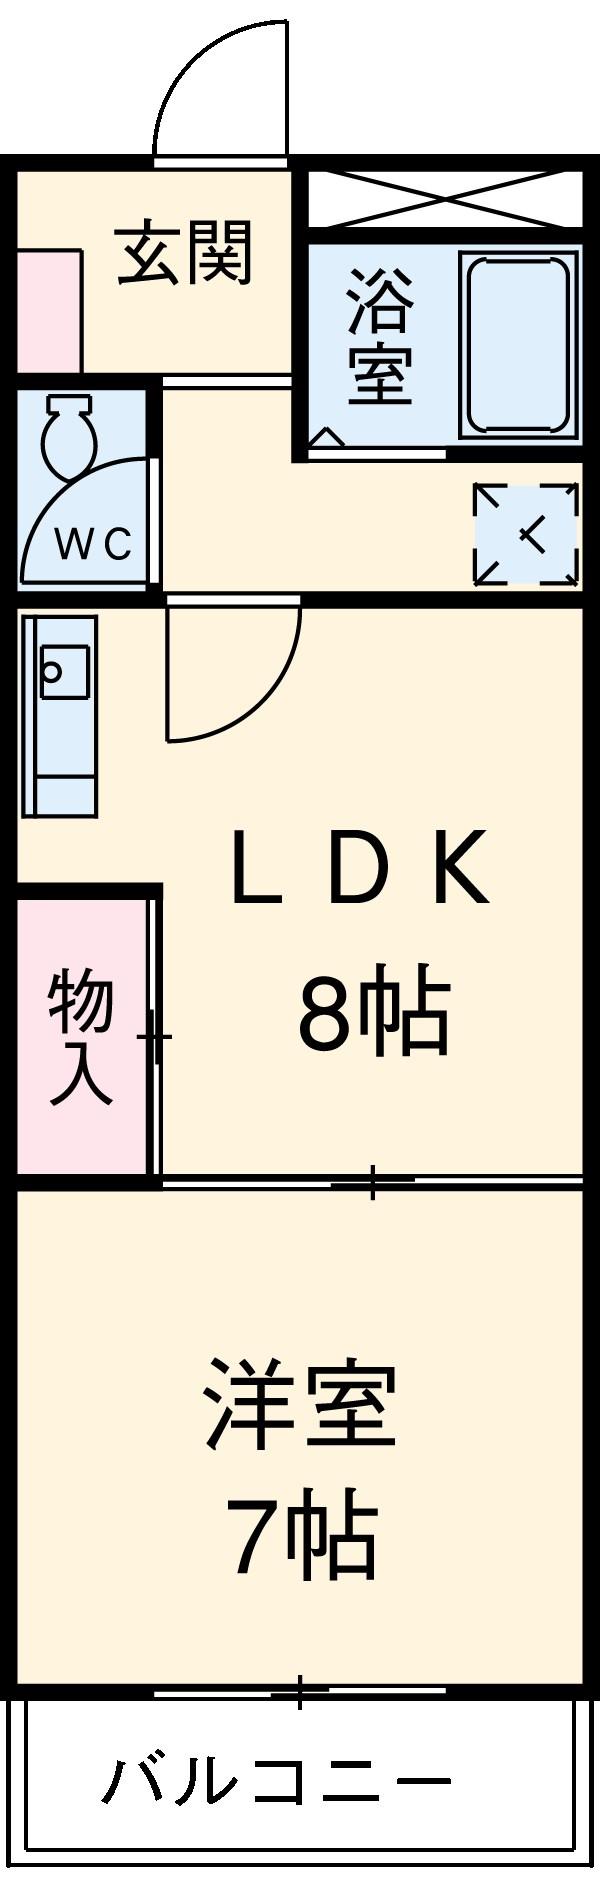 HIGASHIYAMA 306号室の間取り